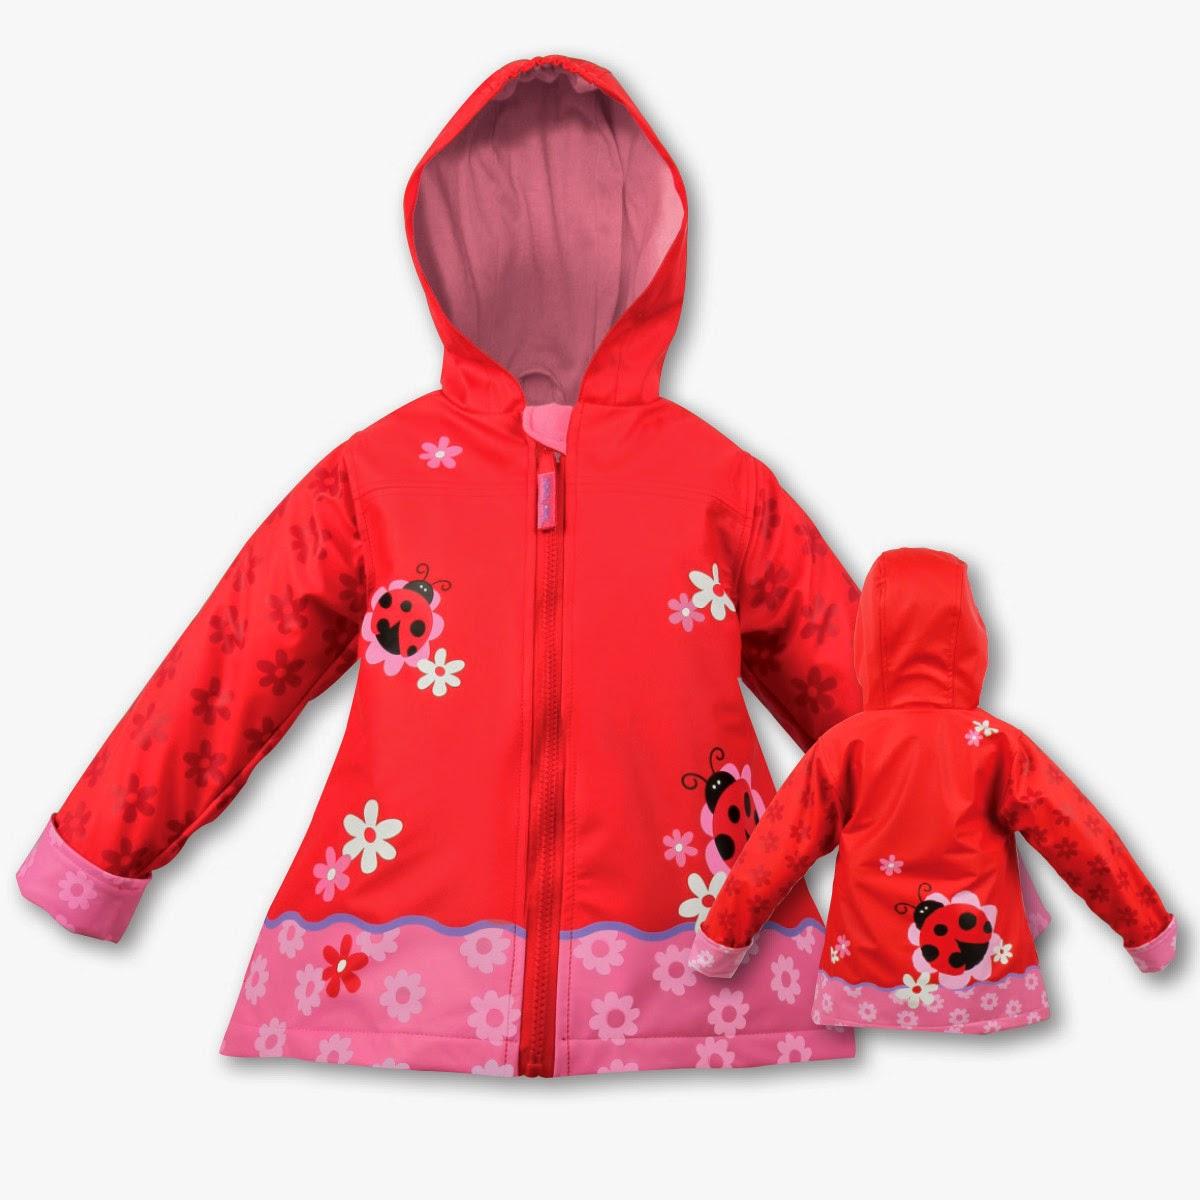 Personalised Raincoats For kids Australia